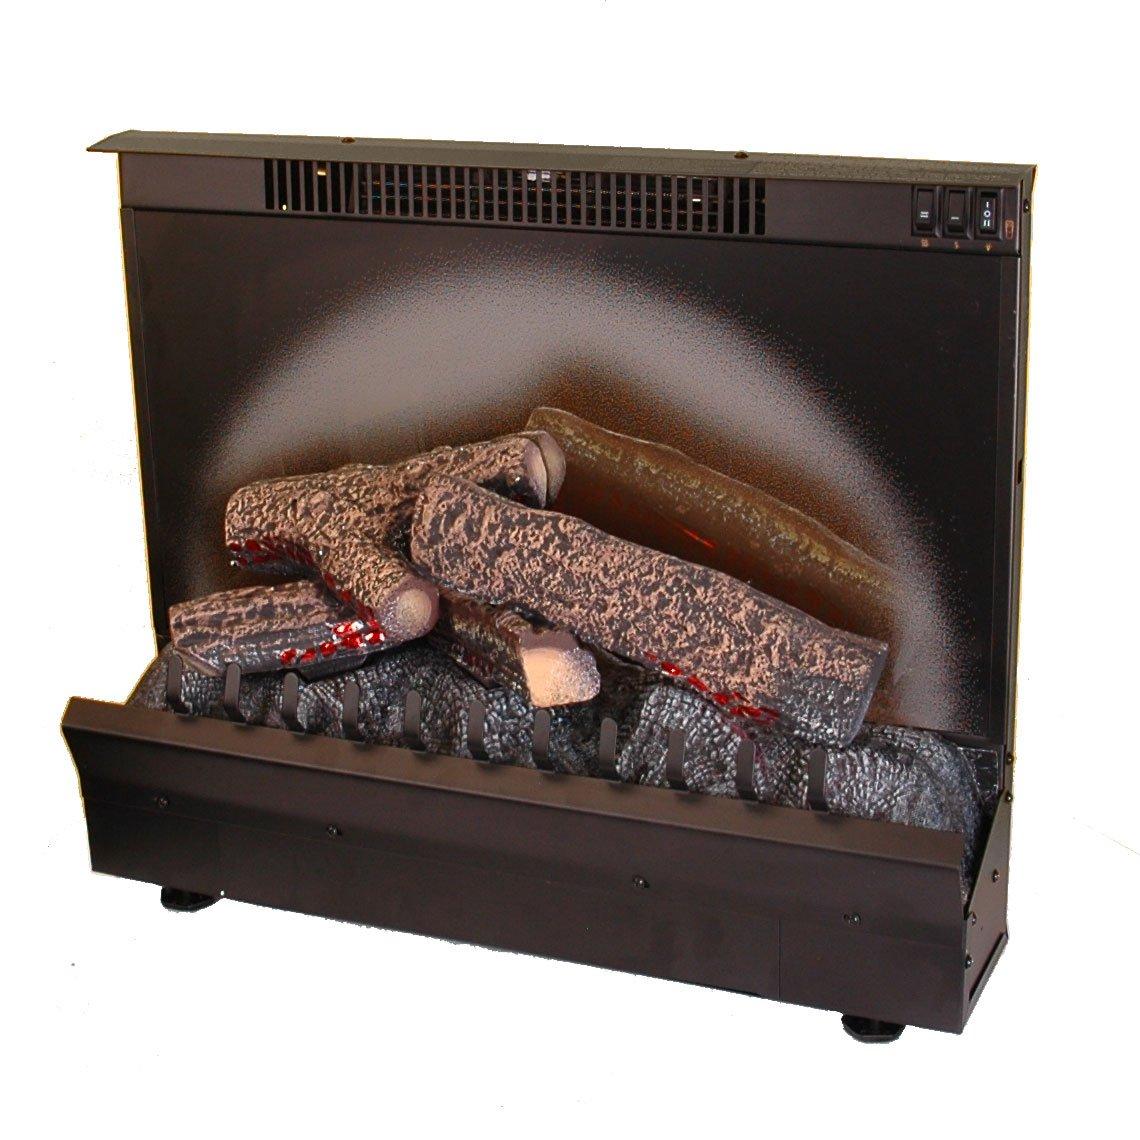 amazon com dimplex north america dimplex electric fireplace